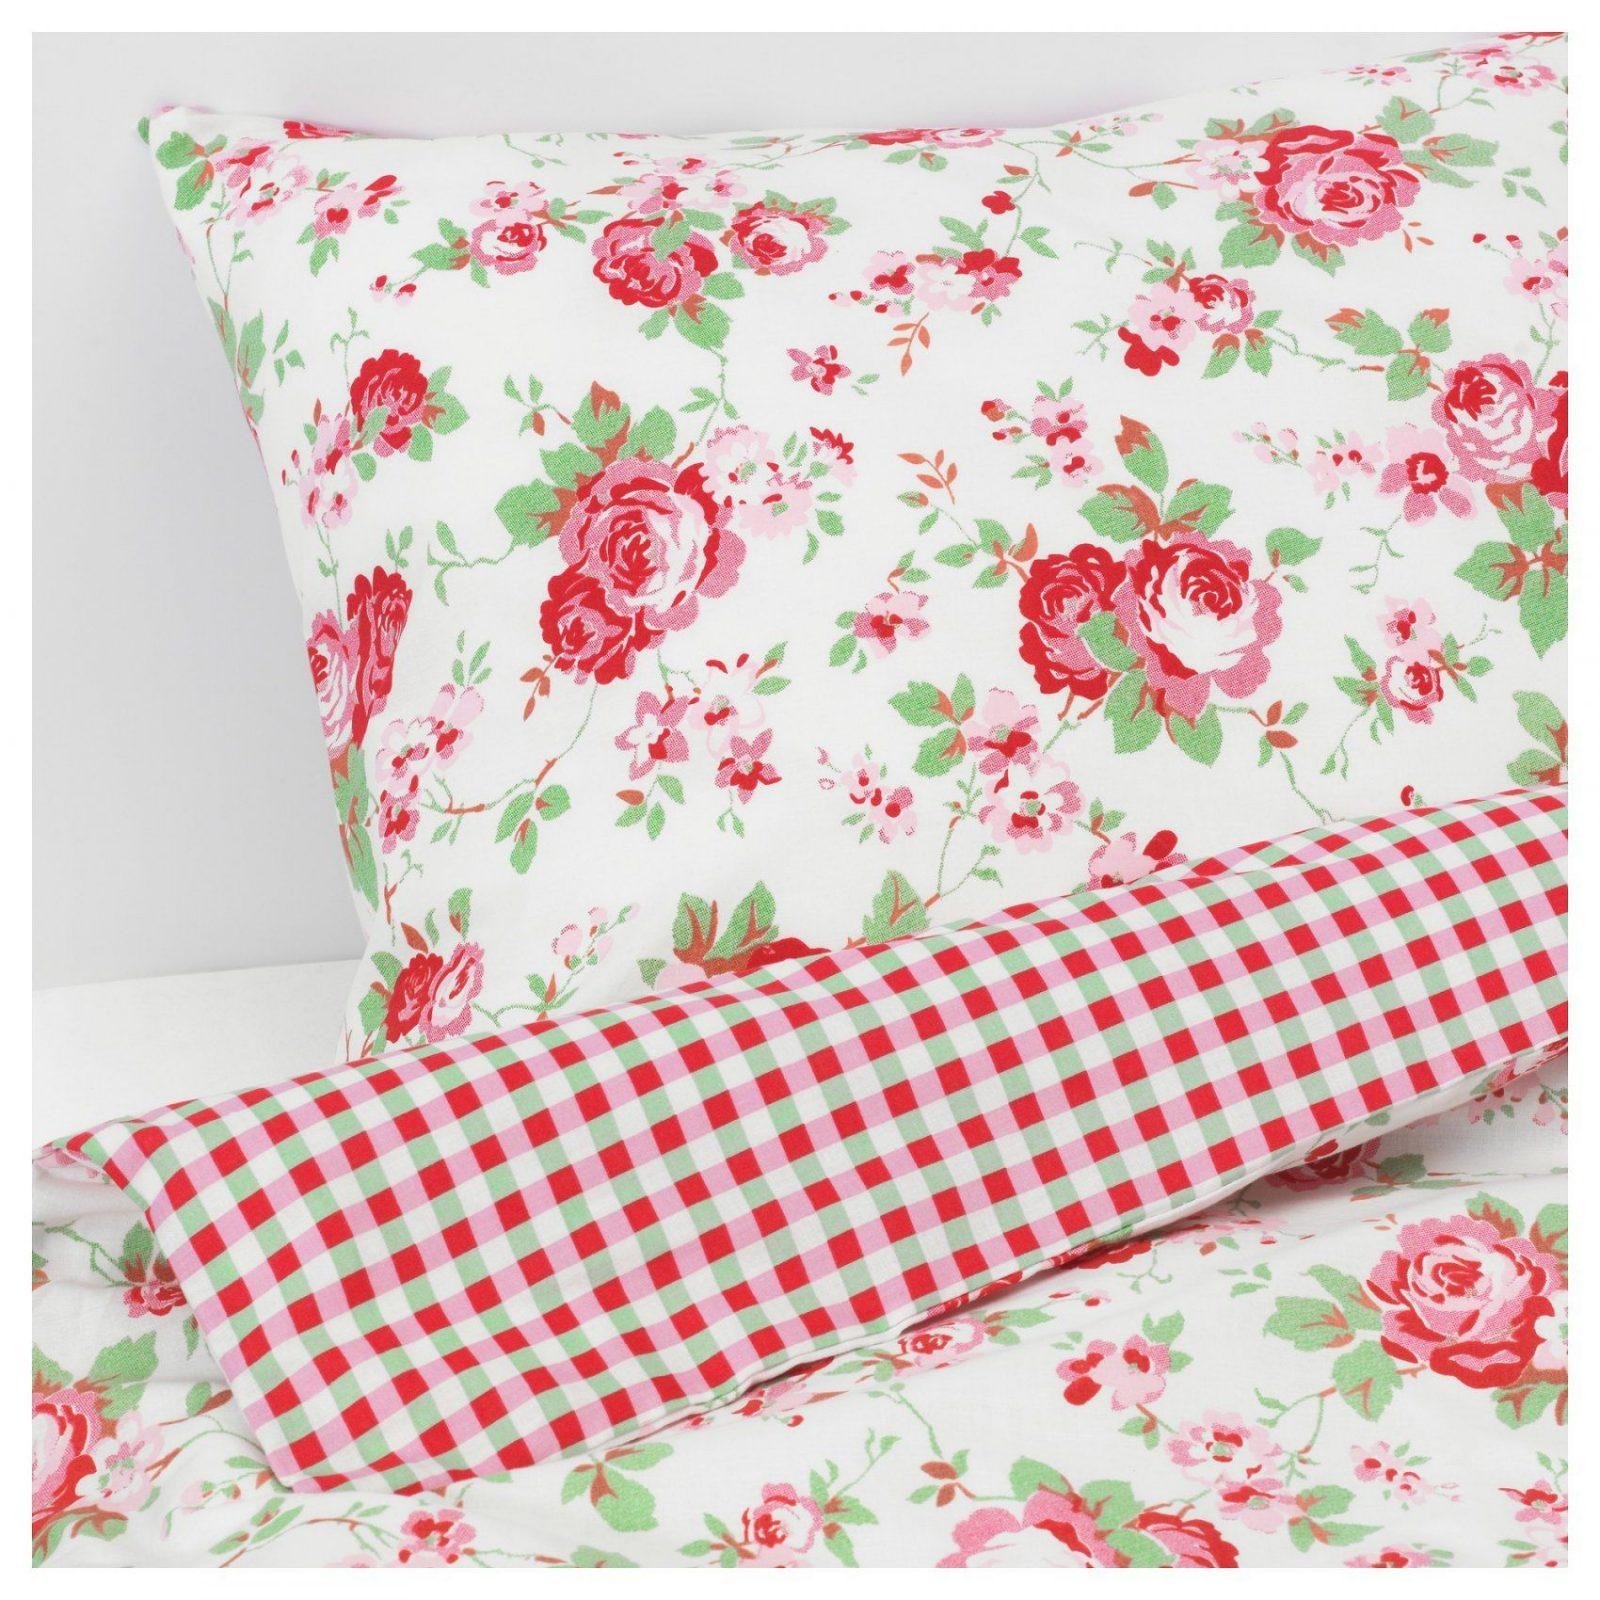 ikea bettw sche rosen haus design ideen. Black Bedroom Furniture Sets. Home Design Ideas